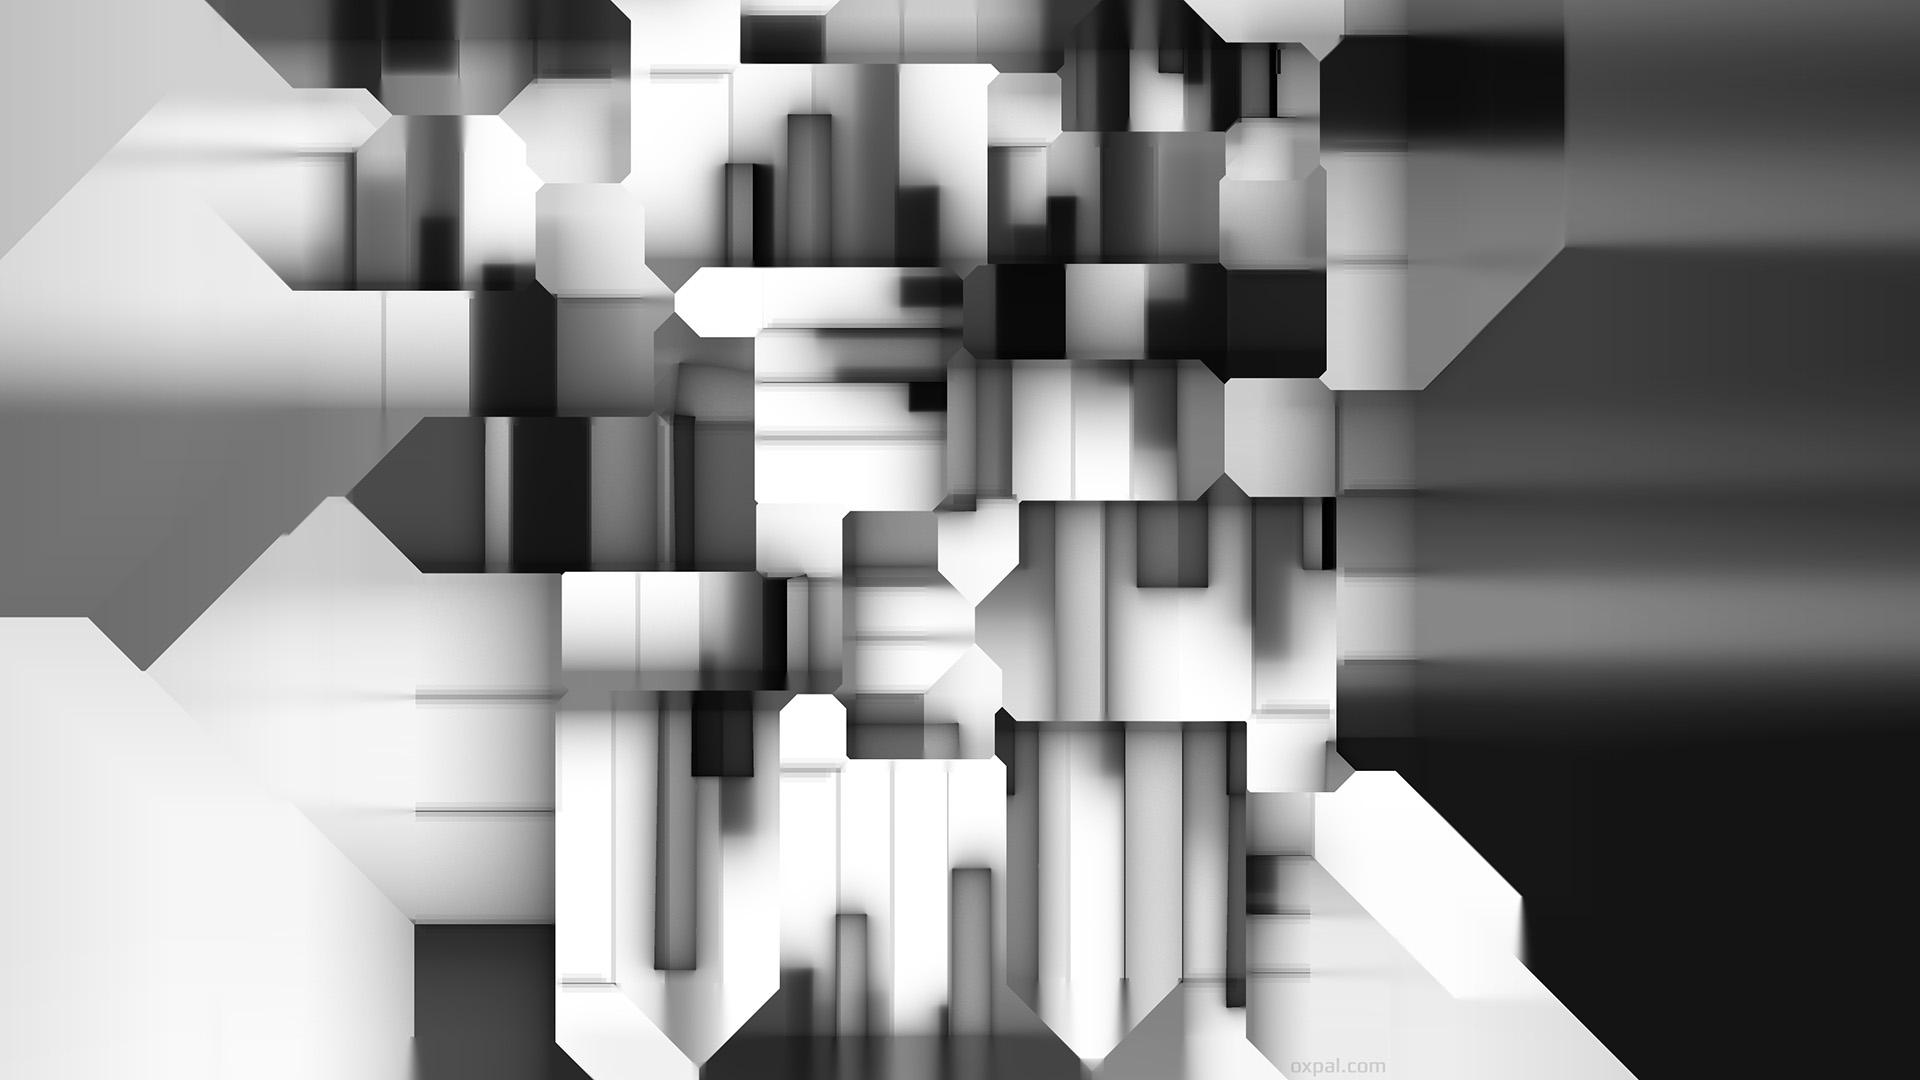 Wallpaper Abstract Full HD